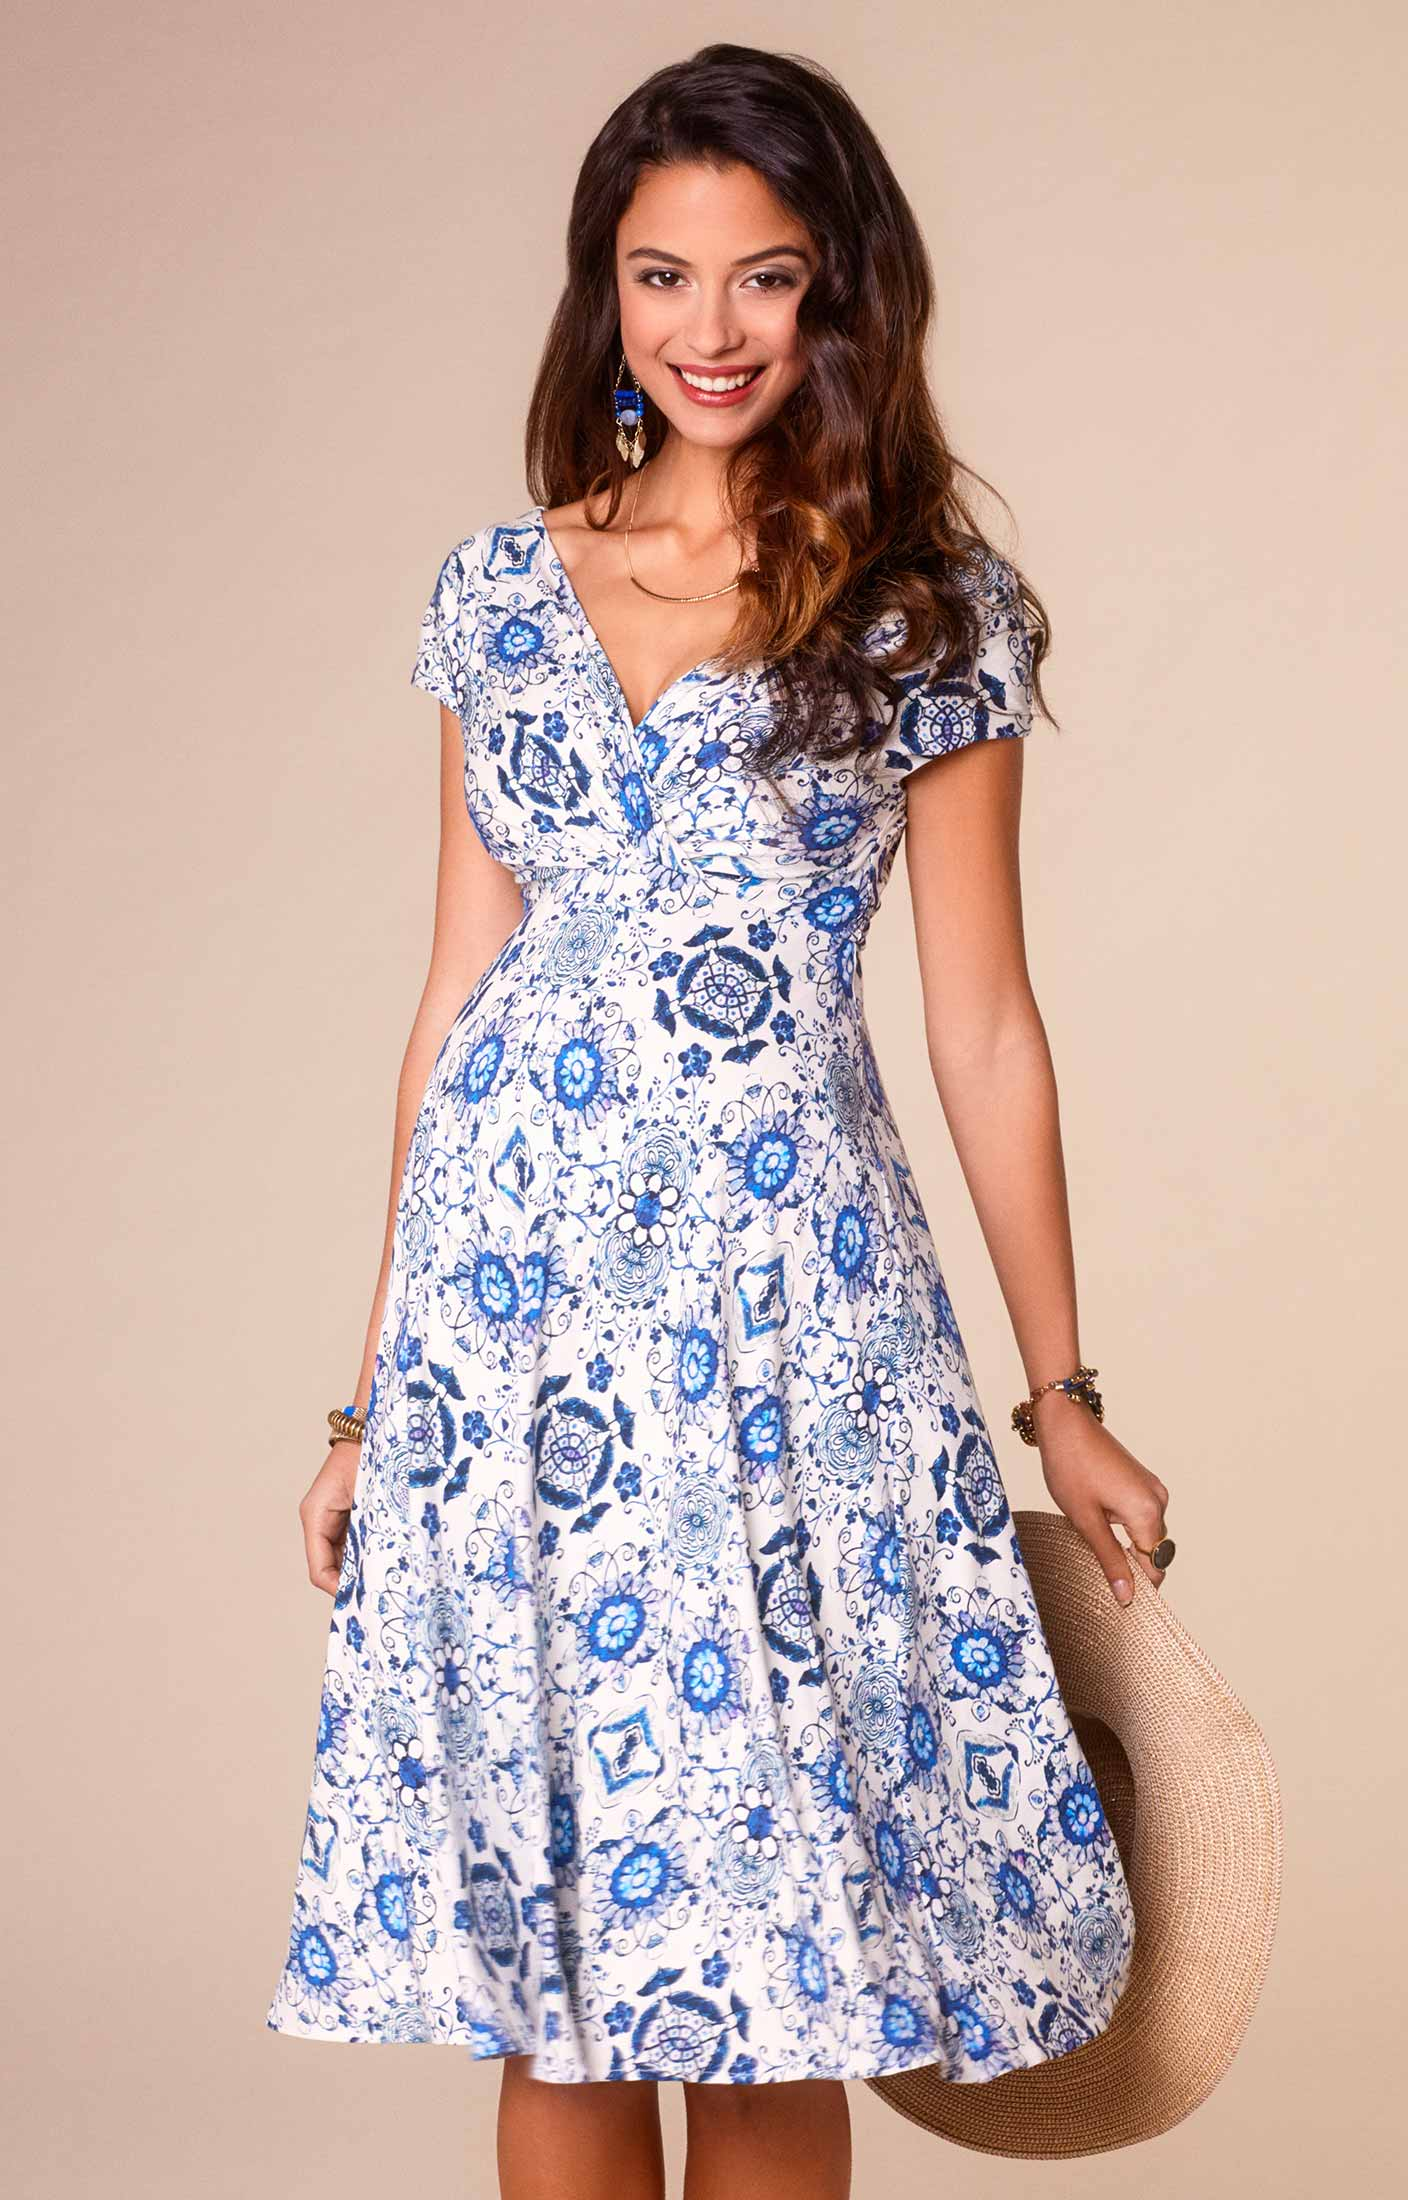 maternity wear alessandra maternity dress short porcelain blue by tiffany rose npgdfao